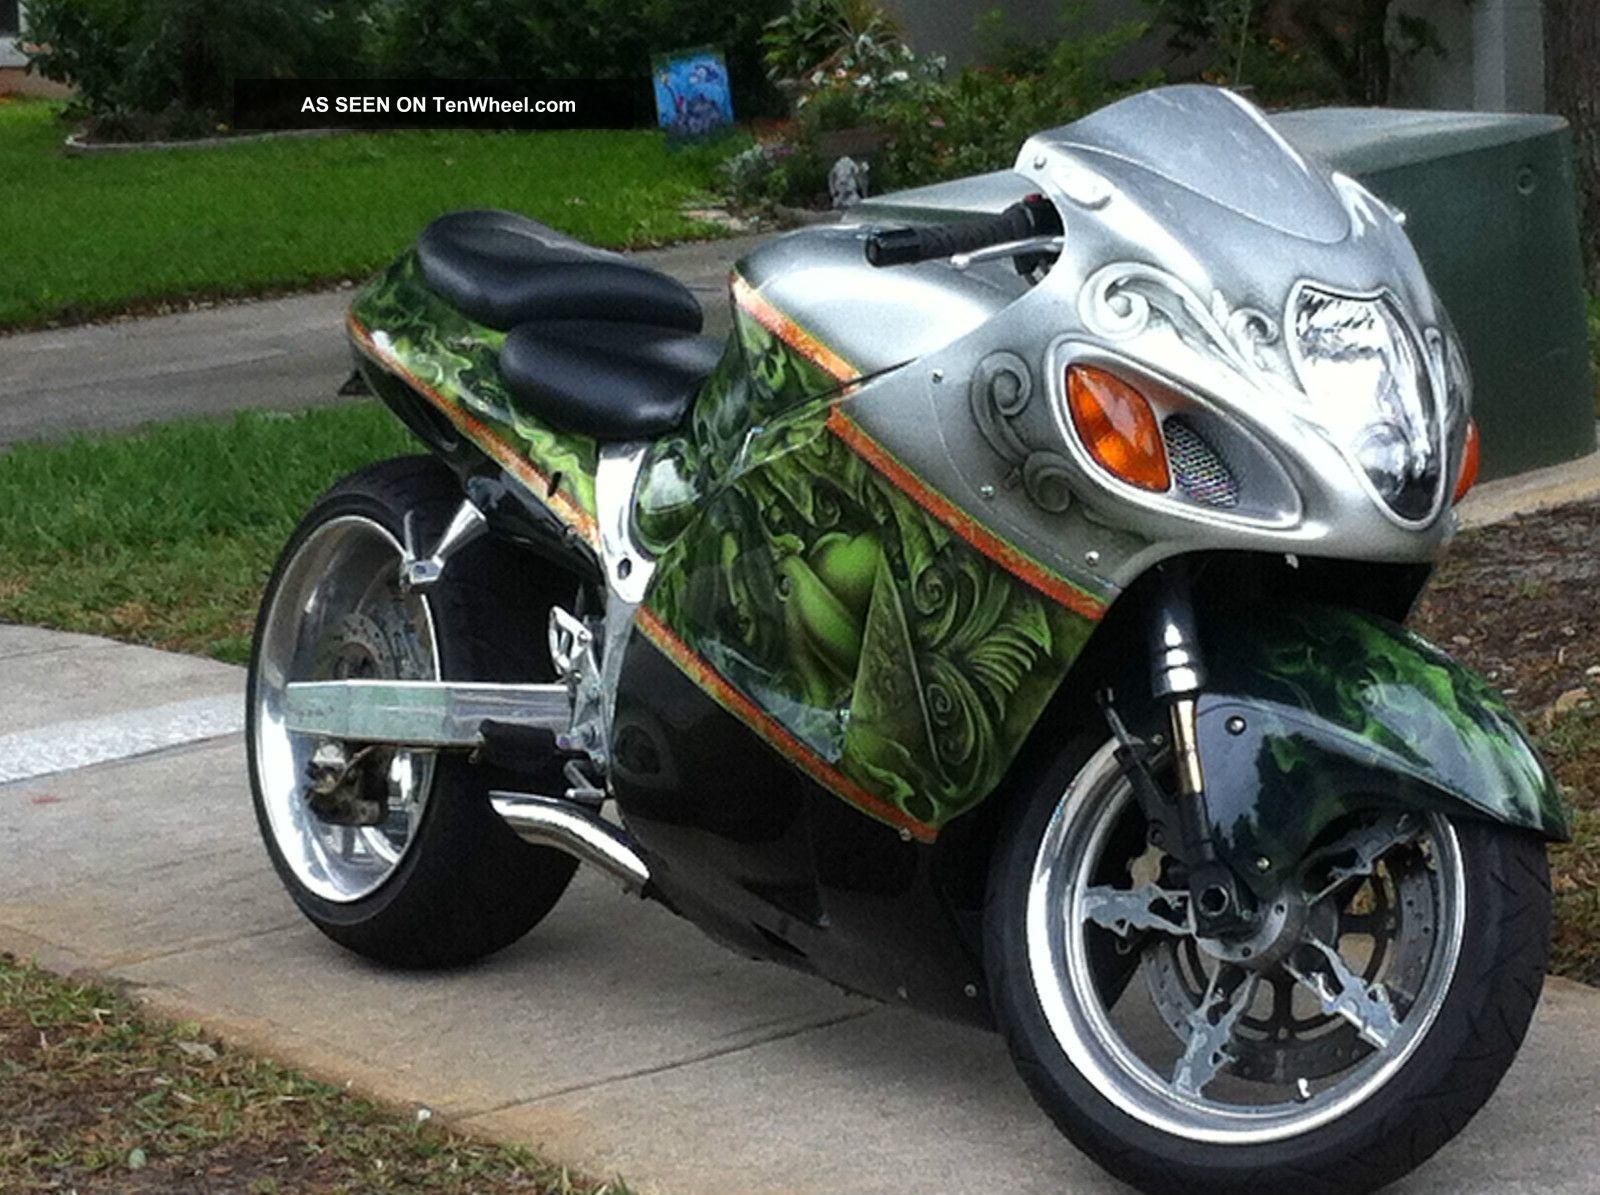 2004 Suzuki Hayabusa 1300 Cc Fully Custom Performance Bike Chad Chambers Paint Hayabusa photo